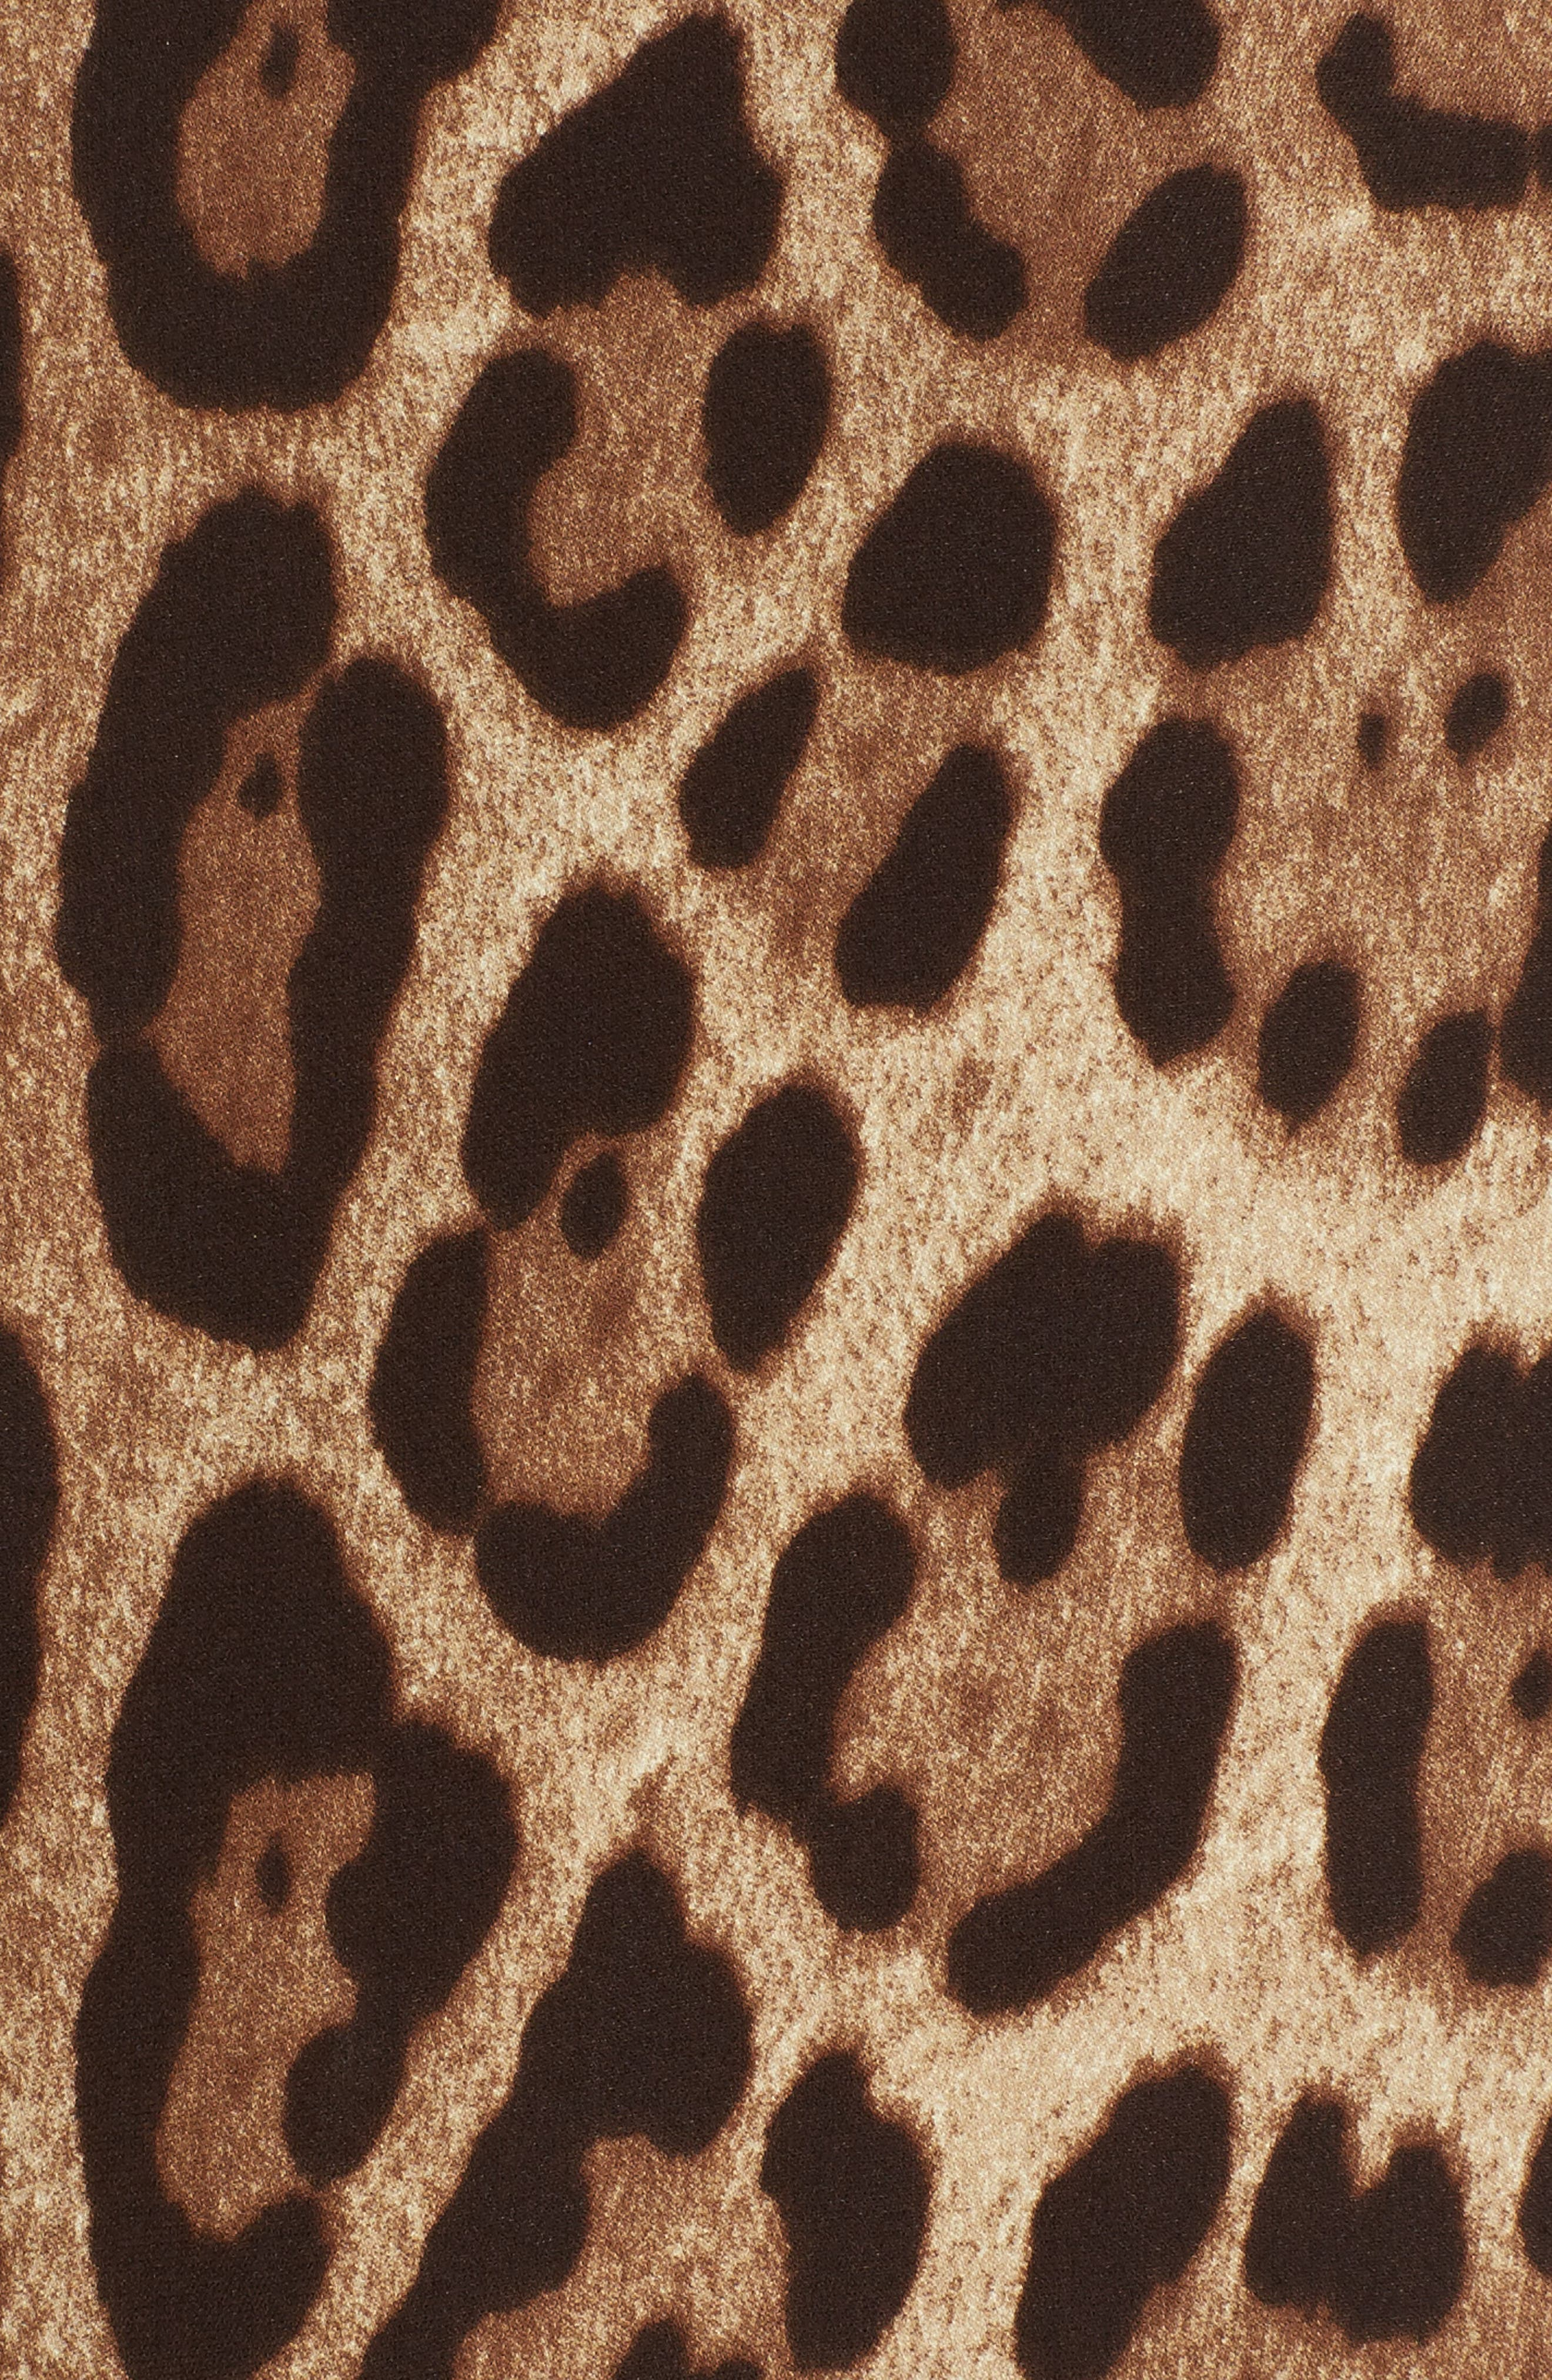 Leopard Print Stretch Silk Dress,                             Alternate thumbnail 5, color,                             200